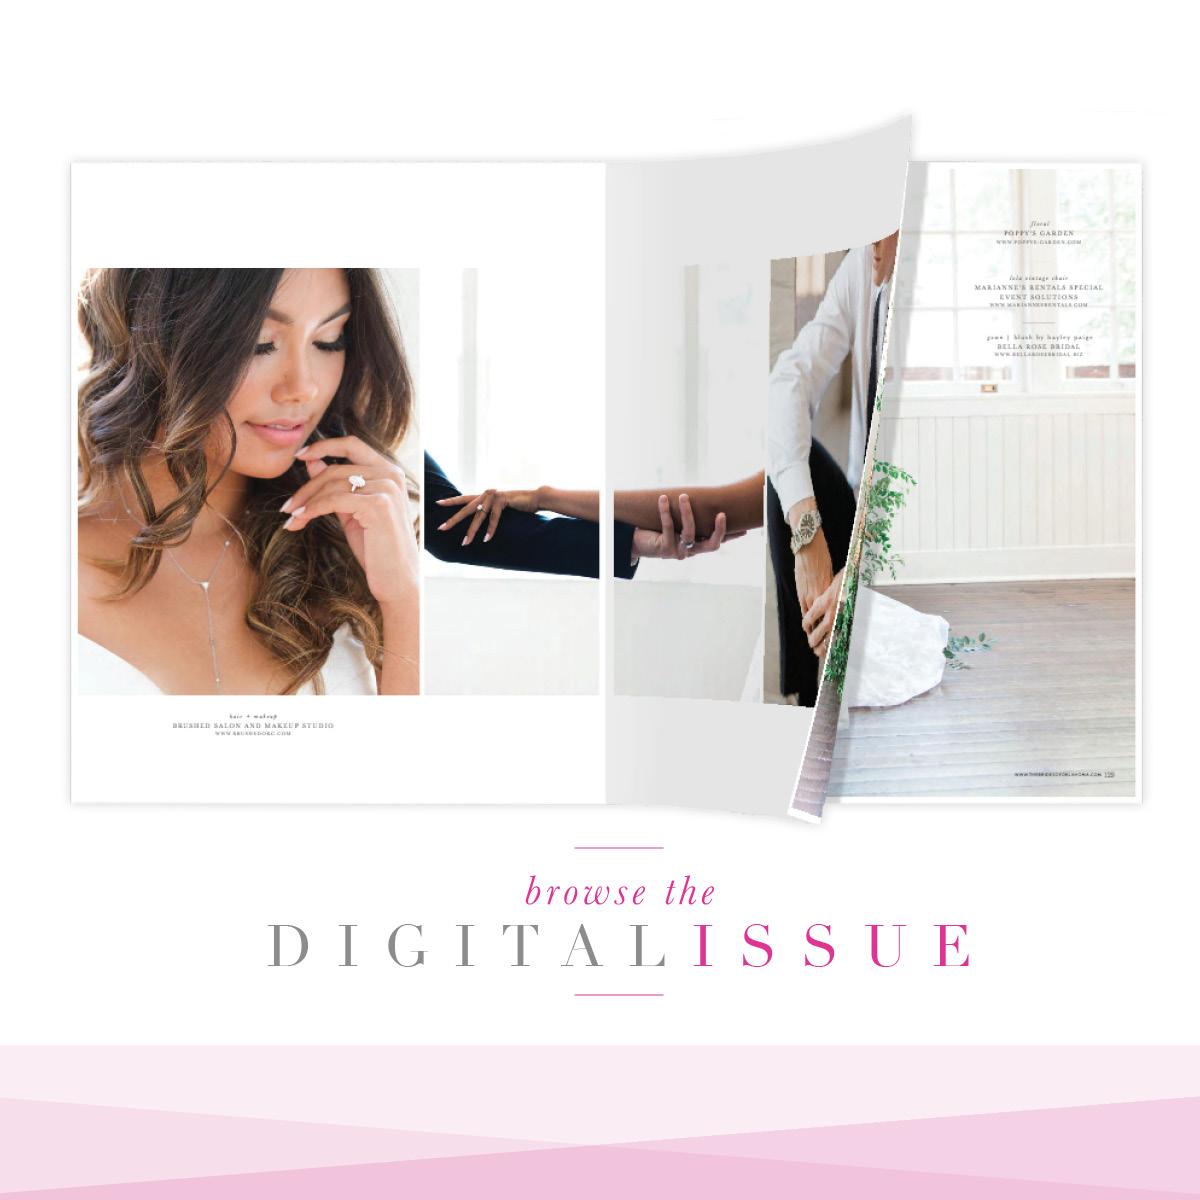 DIGITALISSUE_BLOG_SS2019 Featured